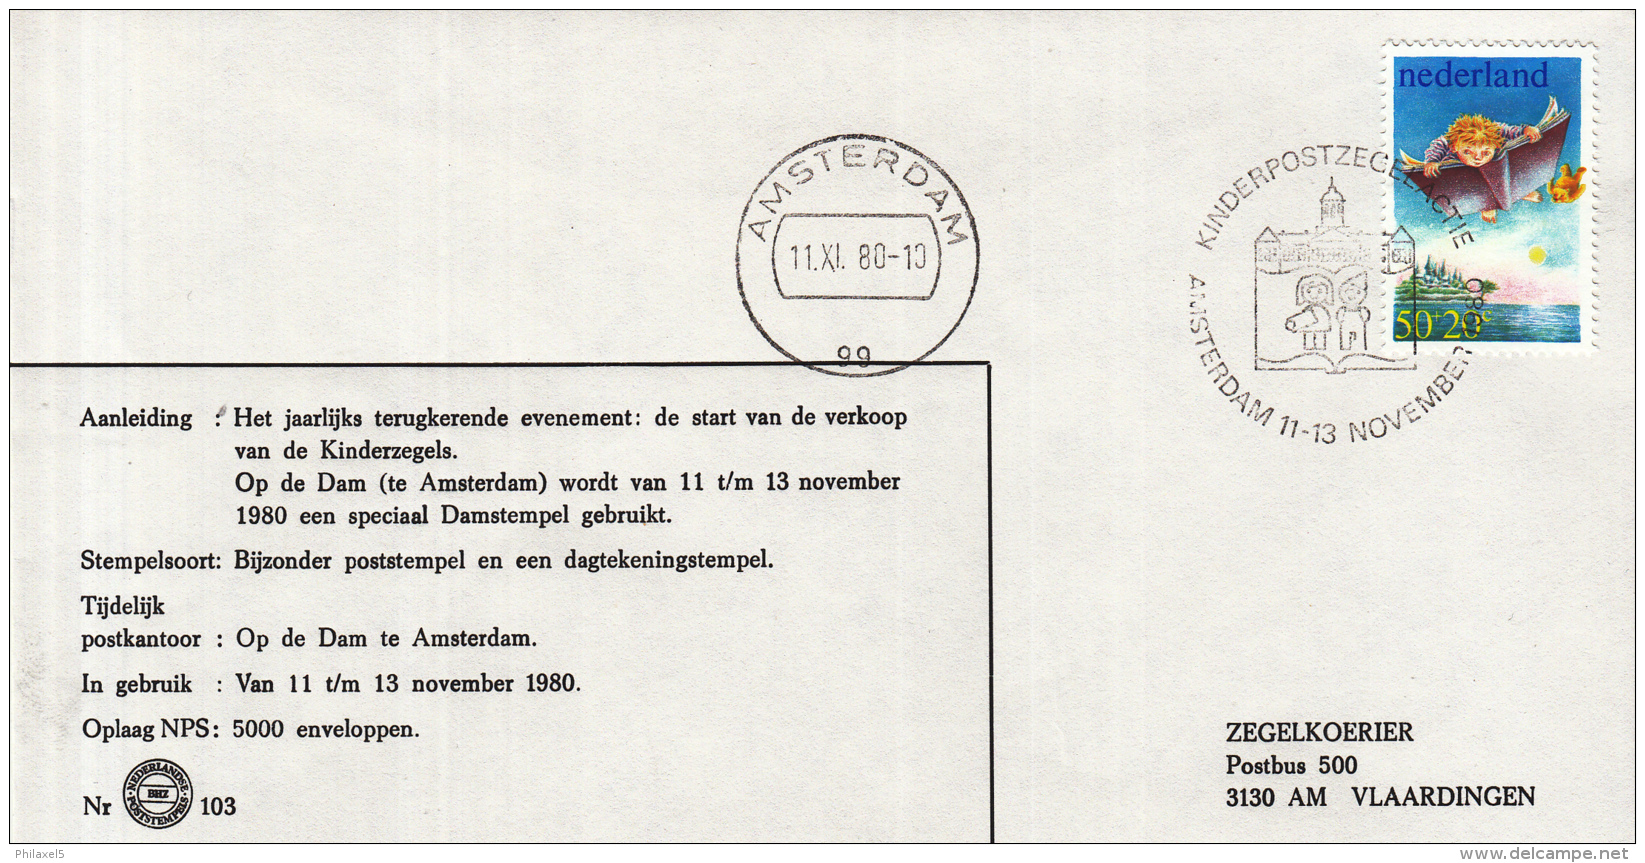 Nederland - 11/13 November 1980 - Kinderpostzegelactie Amsterdam - Damstempel - Z 103 - Marcofilie - EMA (Print Machine)